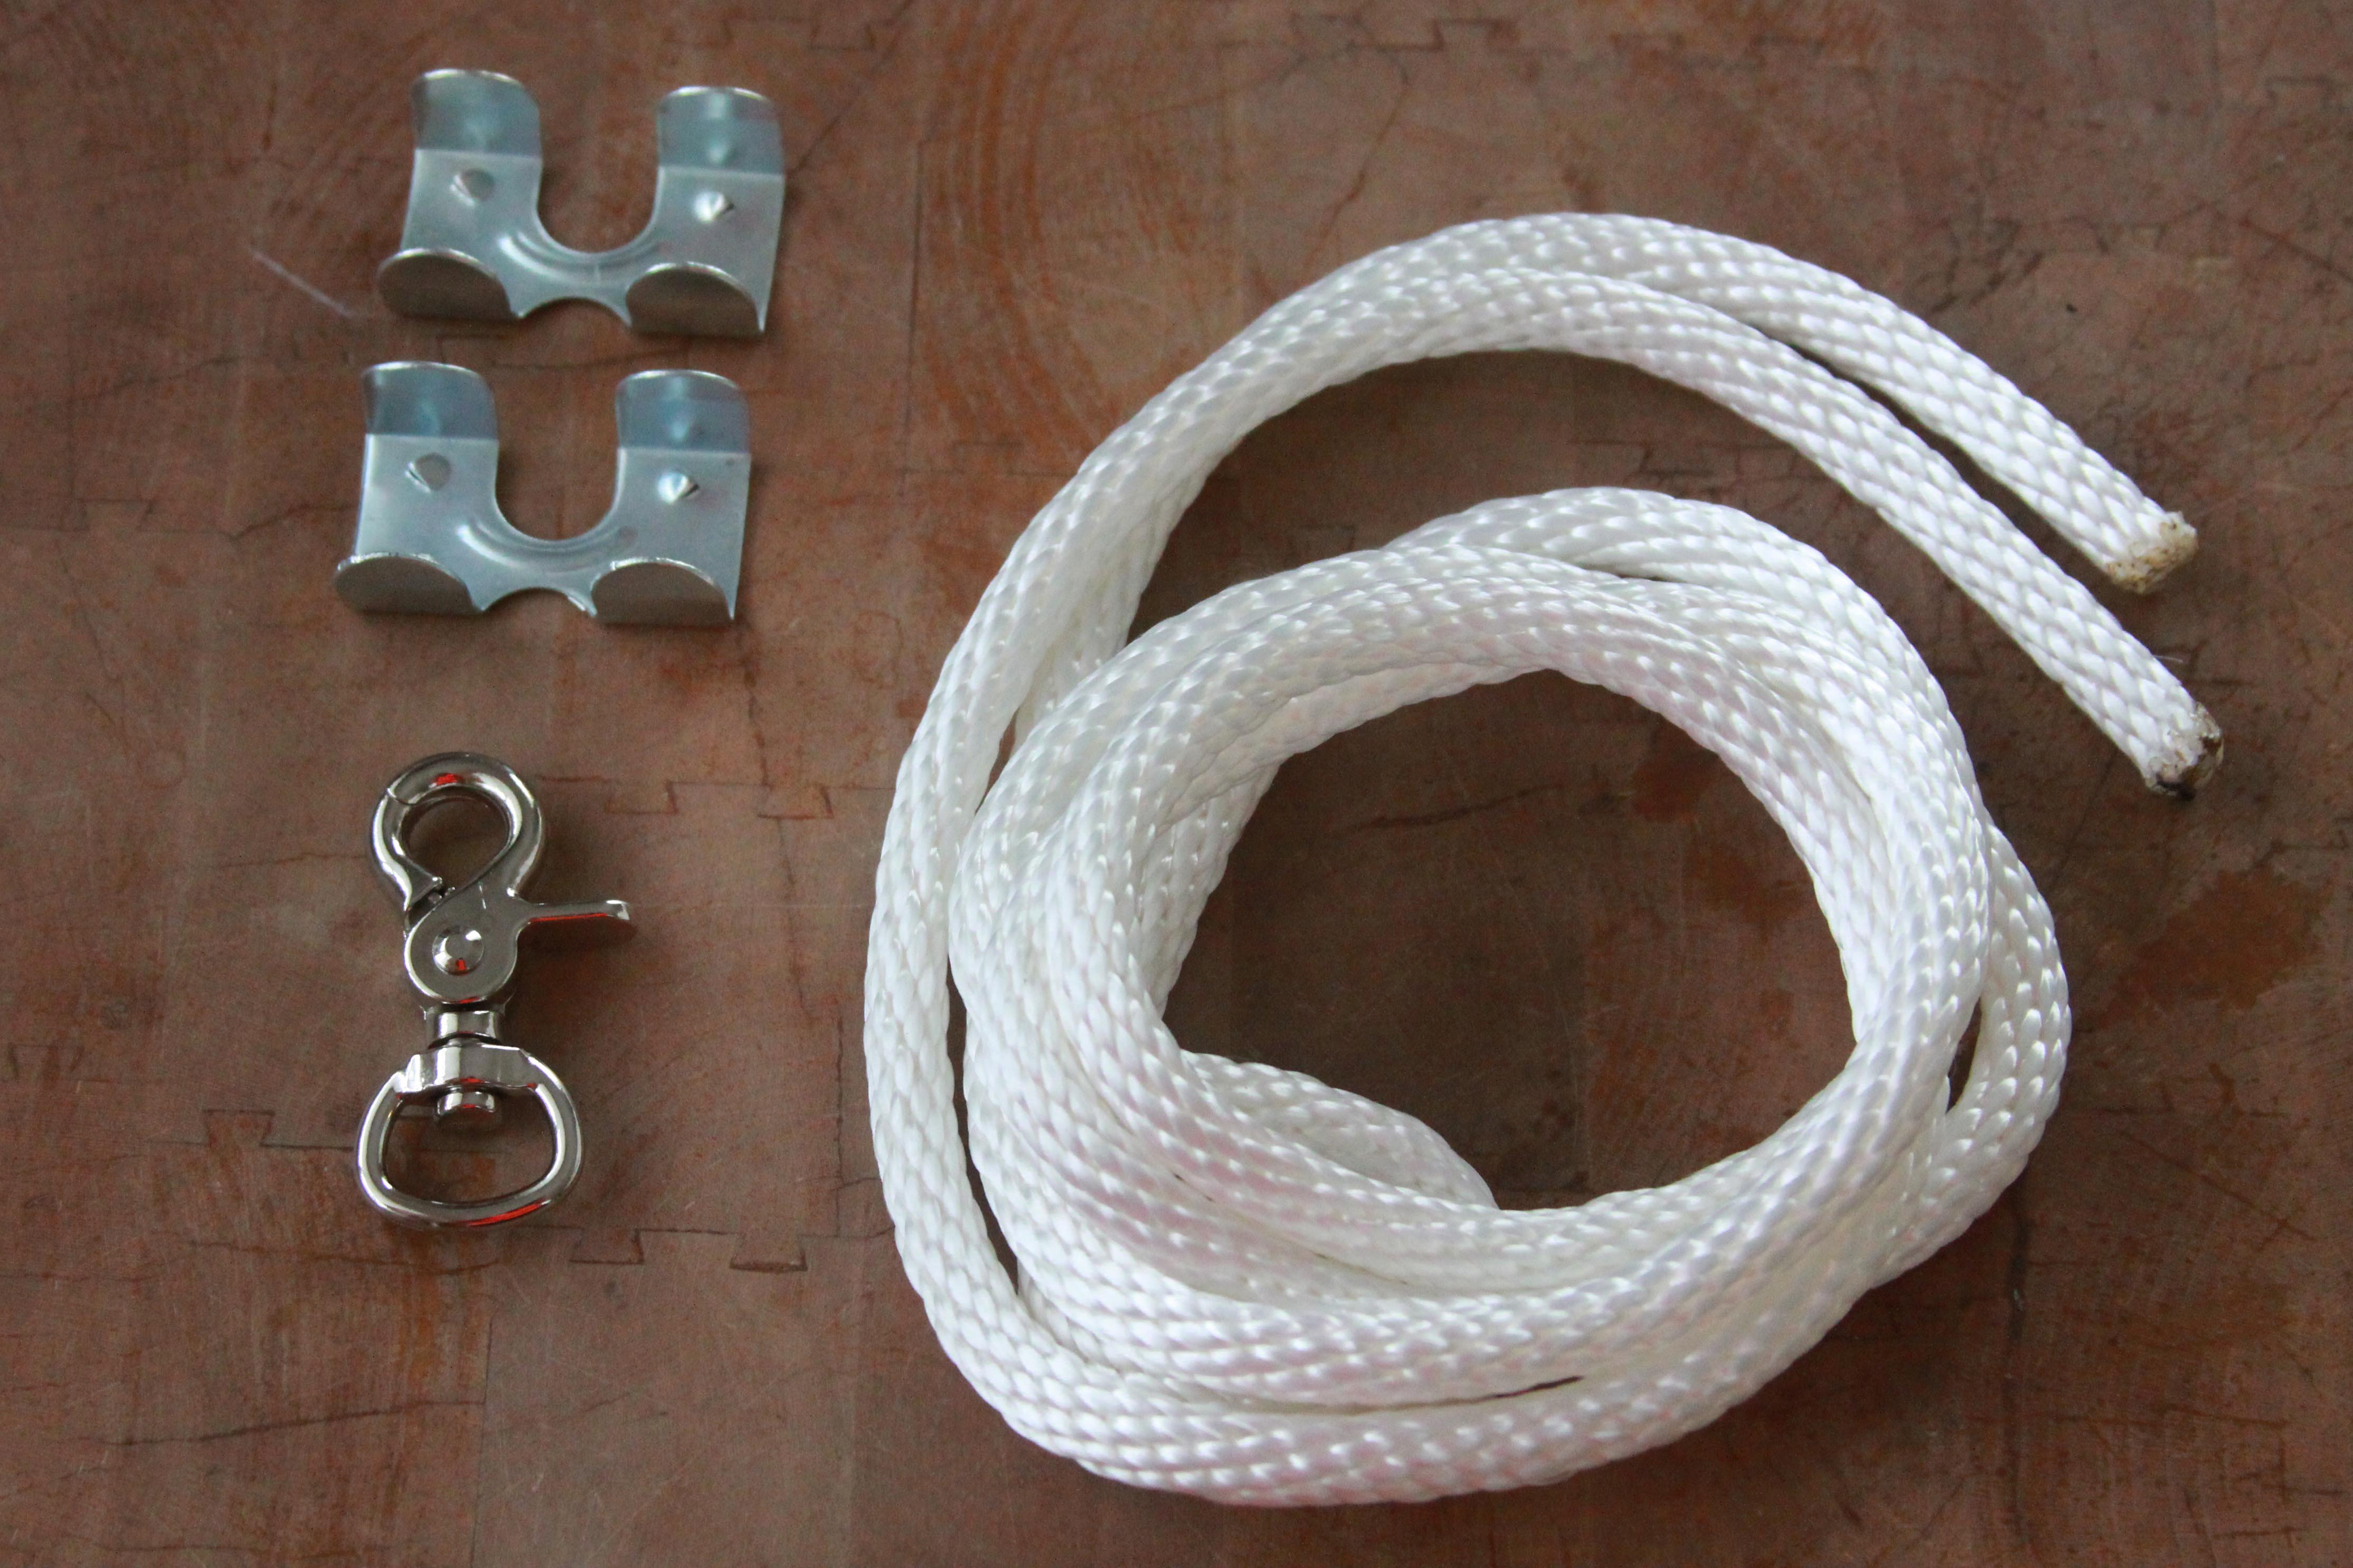 DIY Rope Dog Leash  DIY Rope Leash for Dogs Espresso and CreamEspresso and Cream